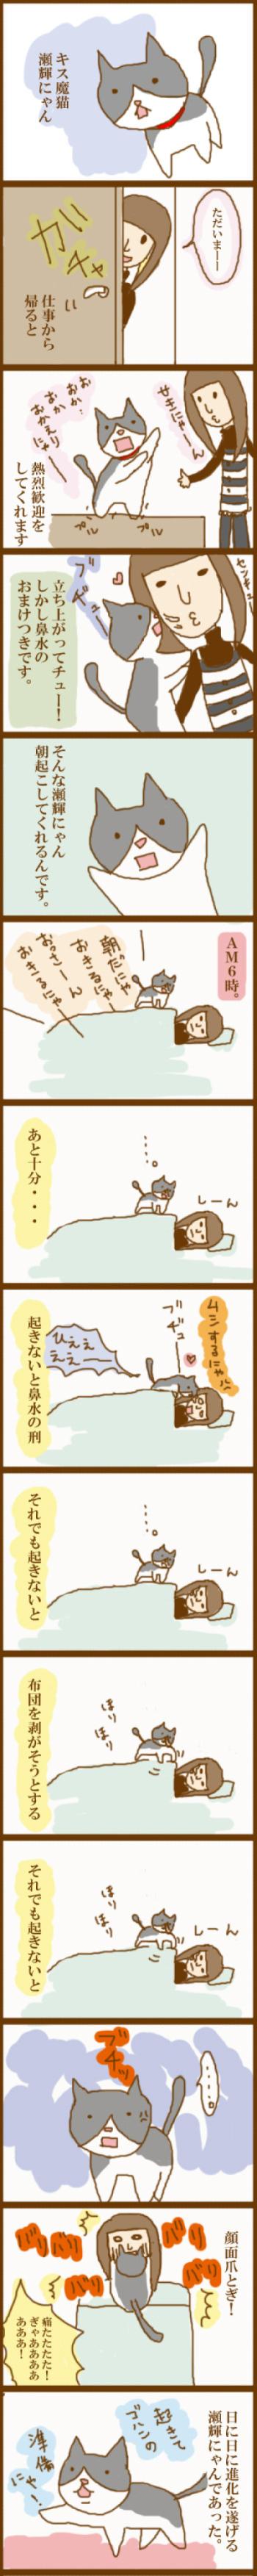 f:id:suzuokayu:20201011194556j:plain